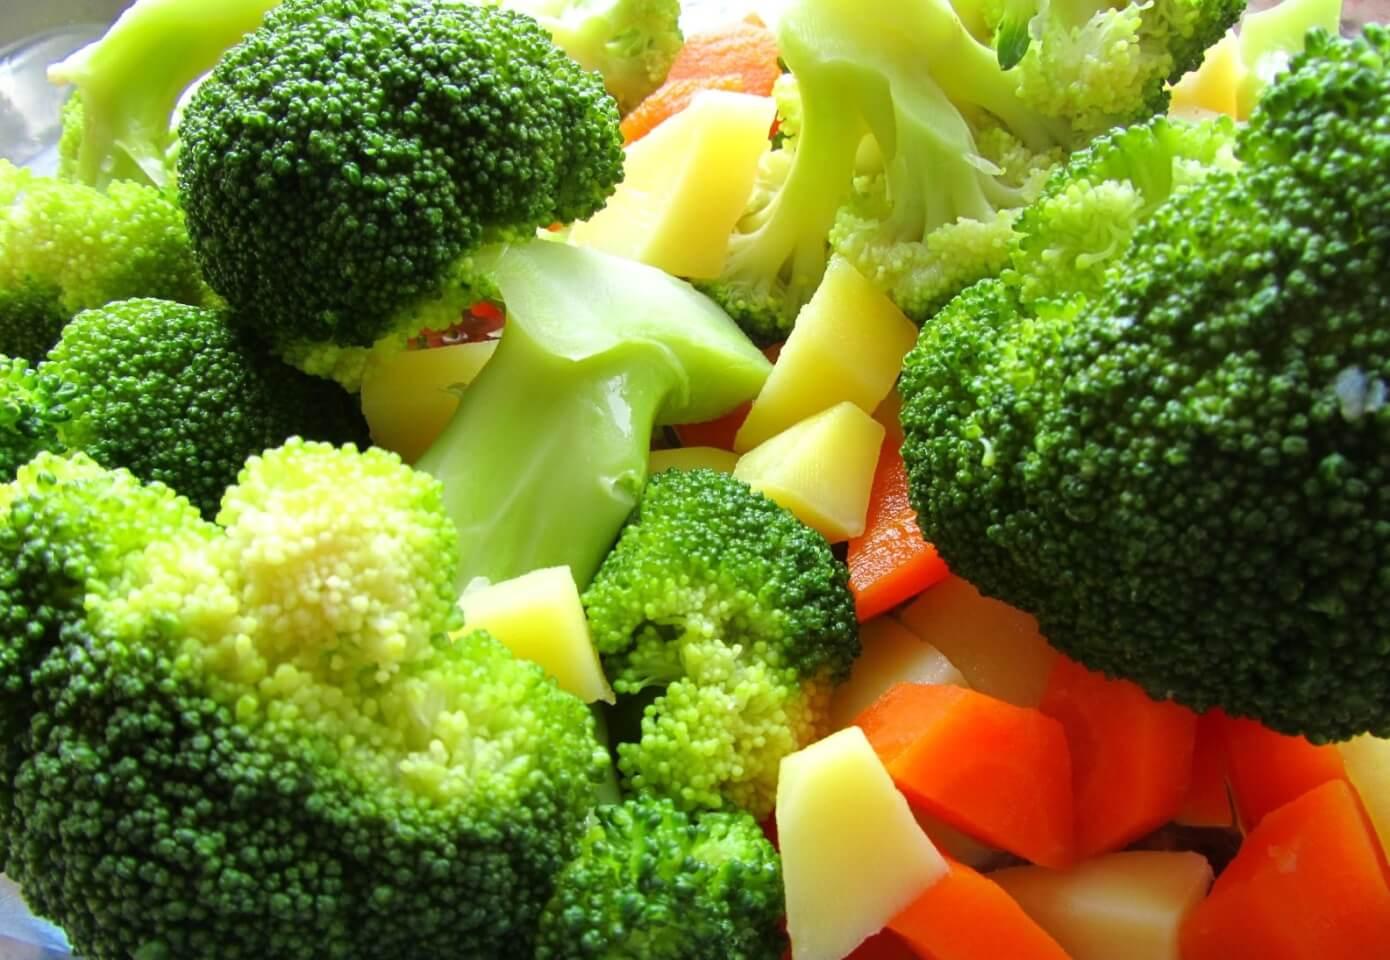 Ayın Yiyeceği Brokolinin Faydaları